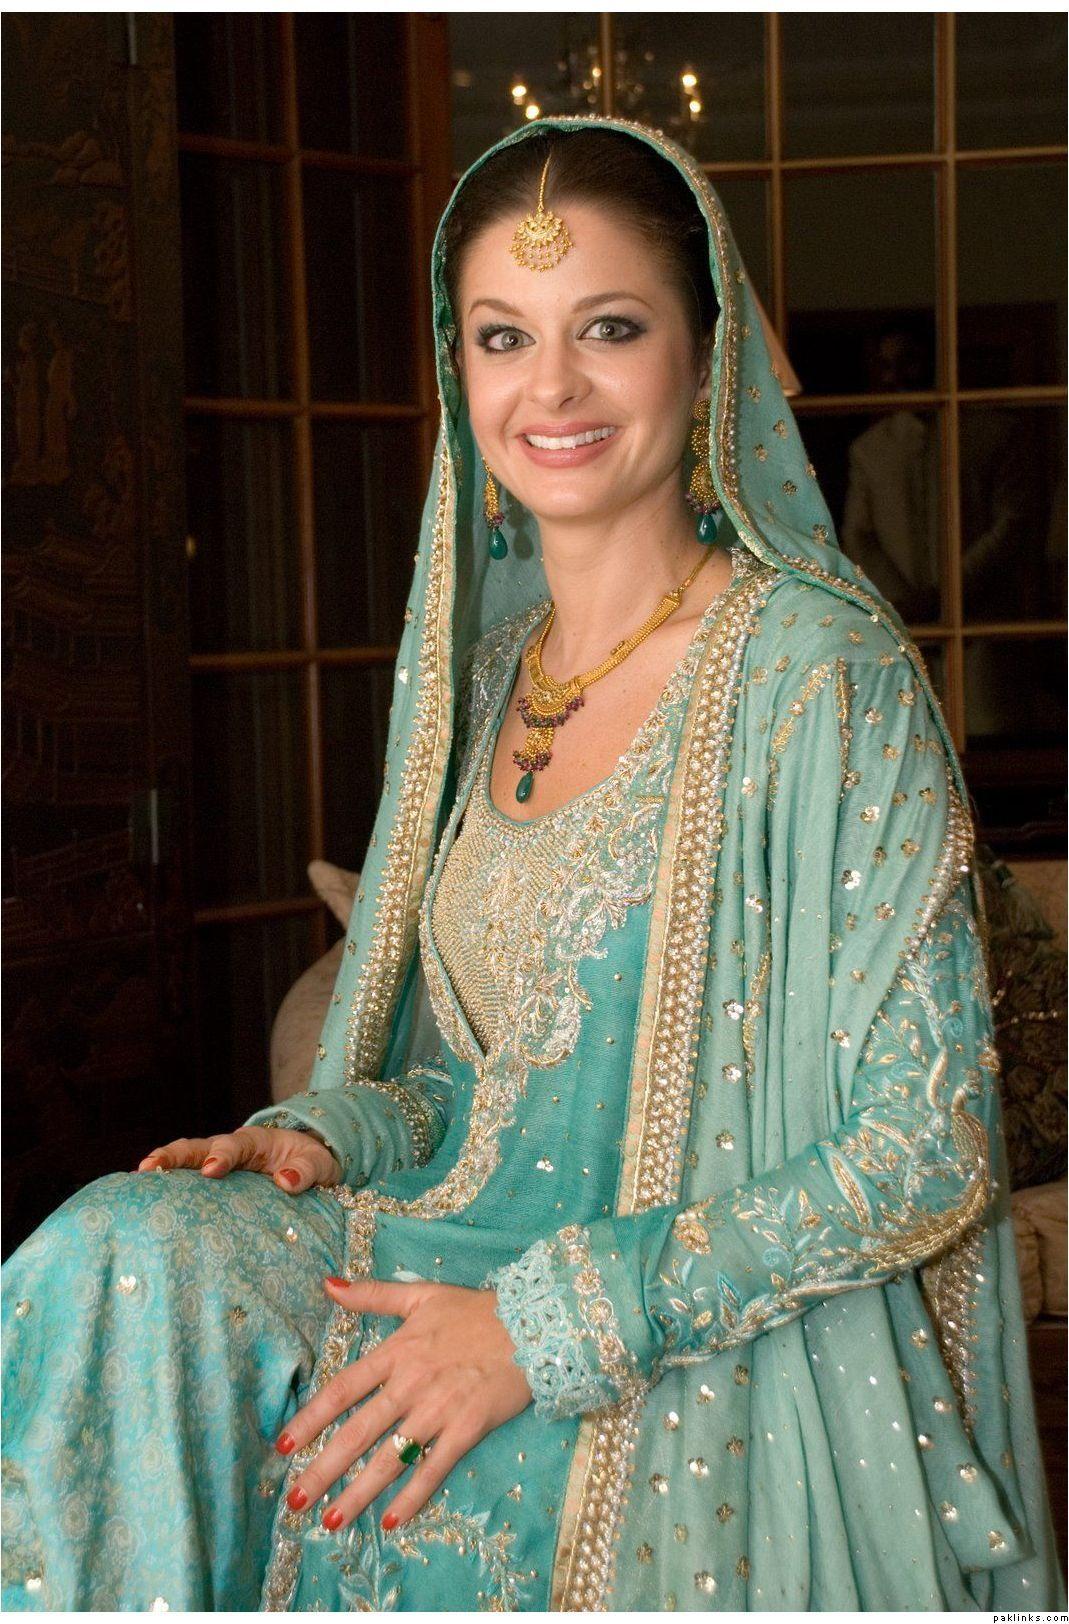 wedding dress | pakistani wedding dresses 2013 for girls men